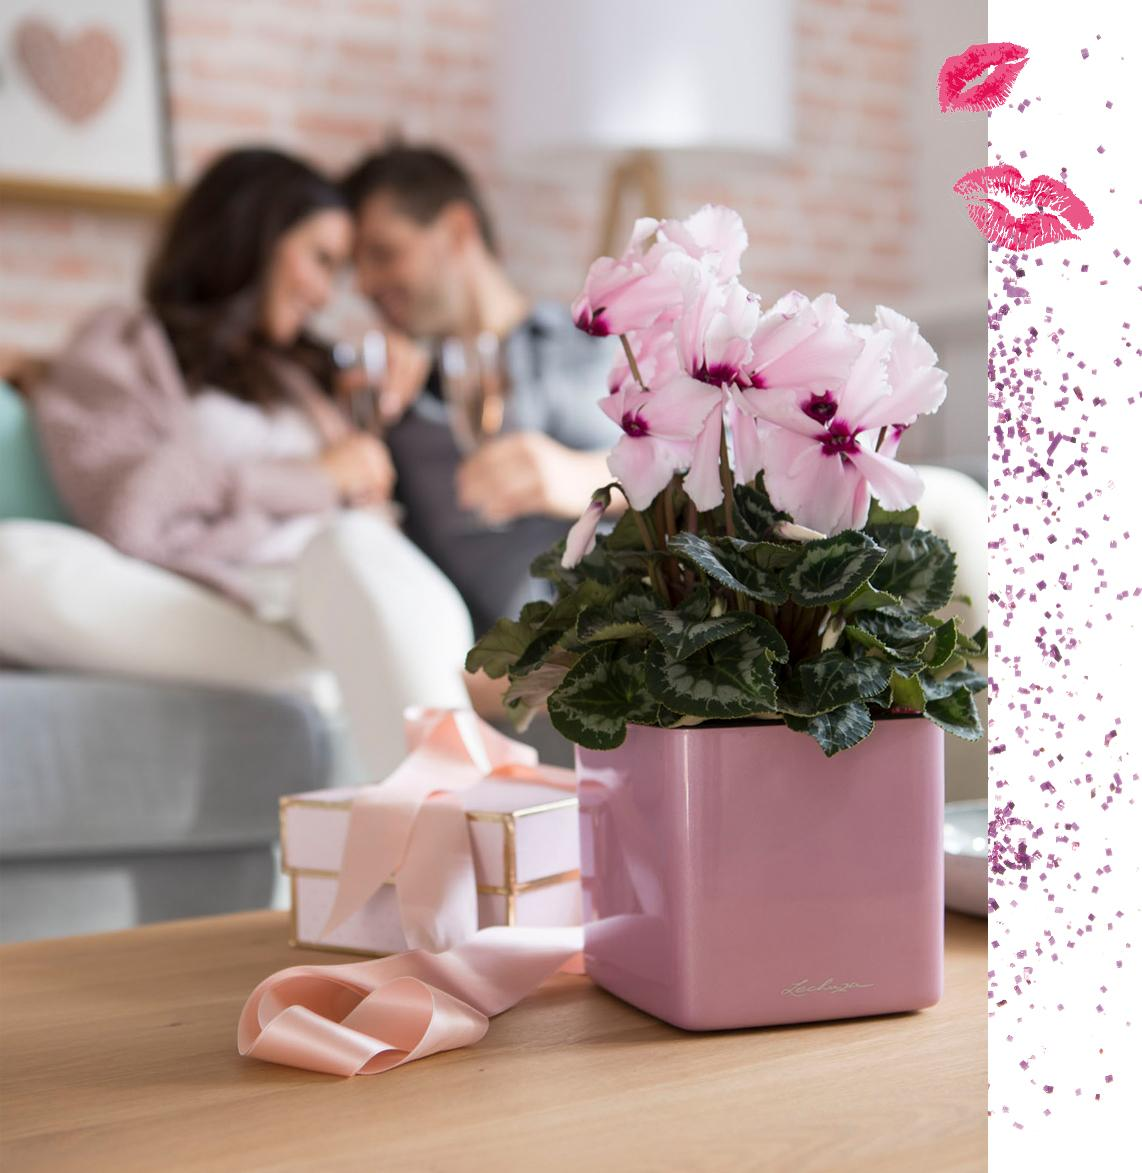 le_tw-gift-ideas_valentine_2